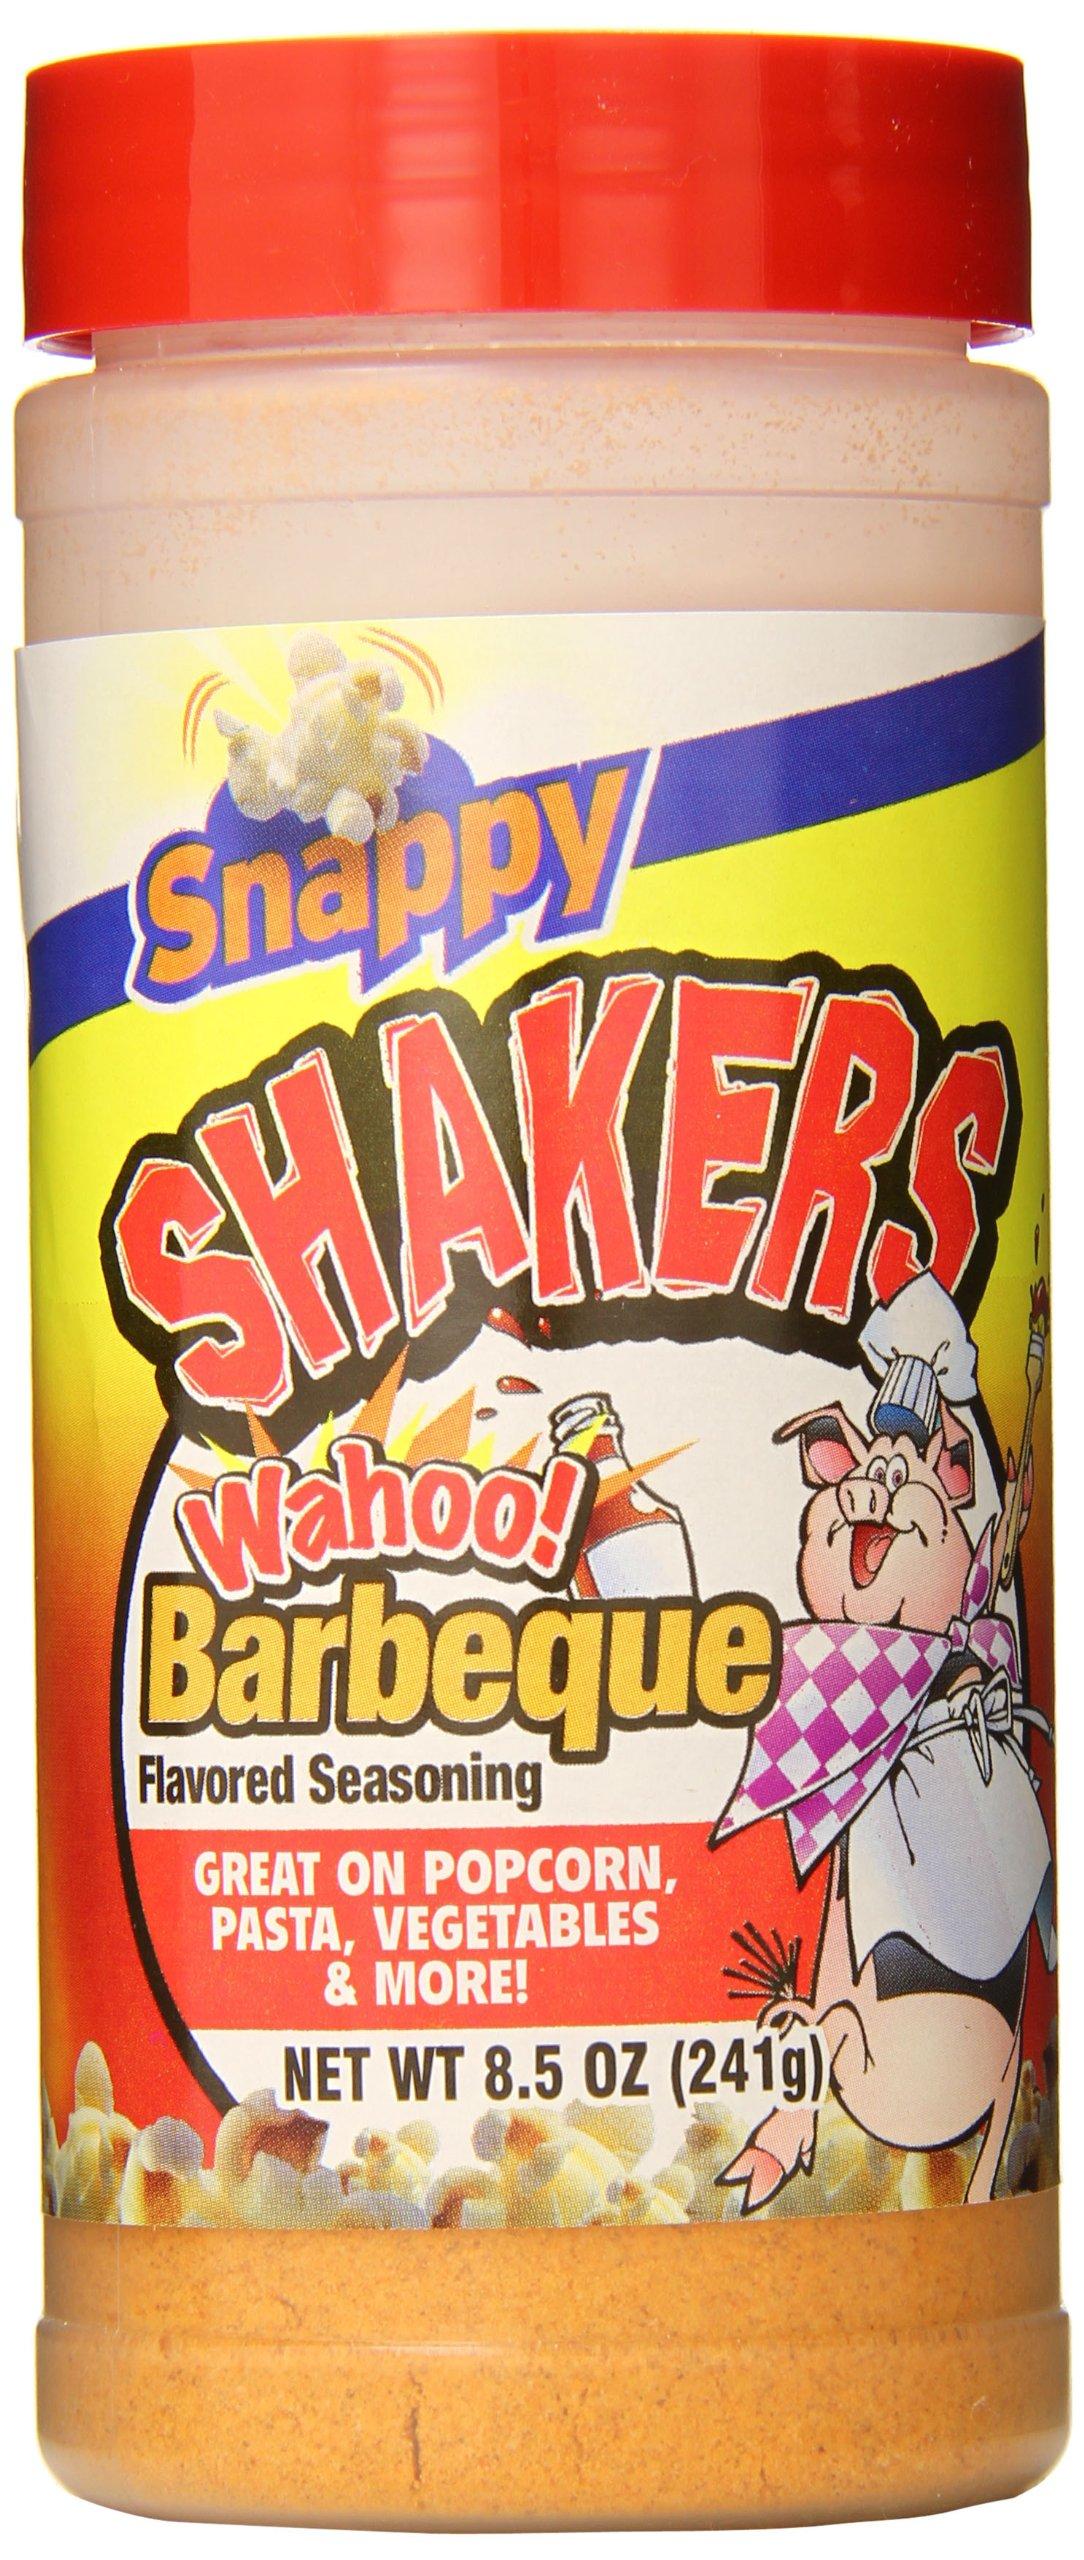 Snappy Popcorn Shaker, Wahoo BBQ, 8.5 oz. by Snappy Popcorn